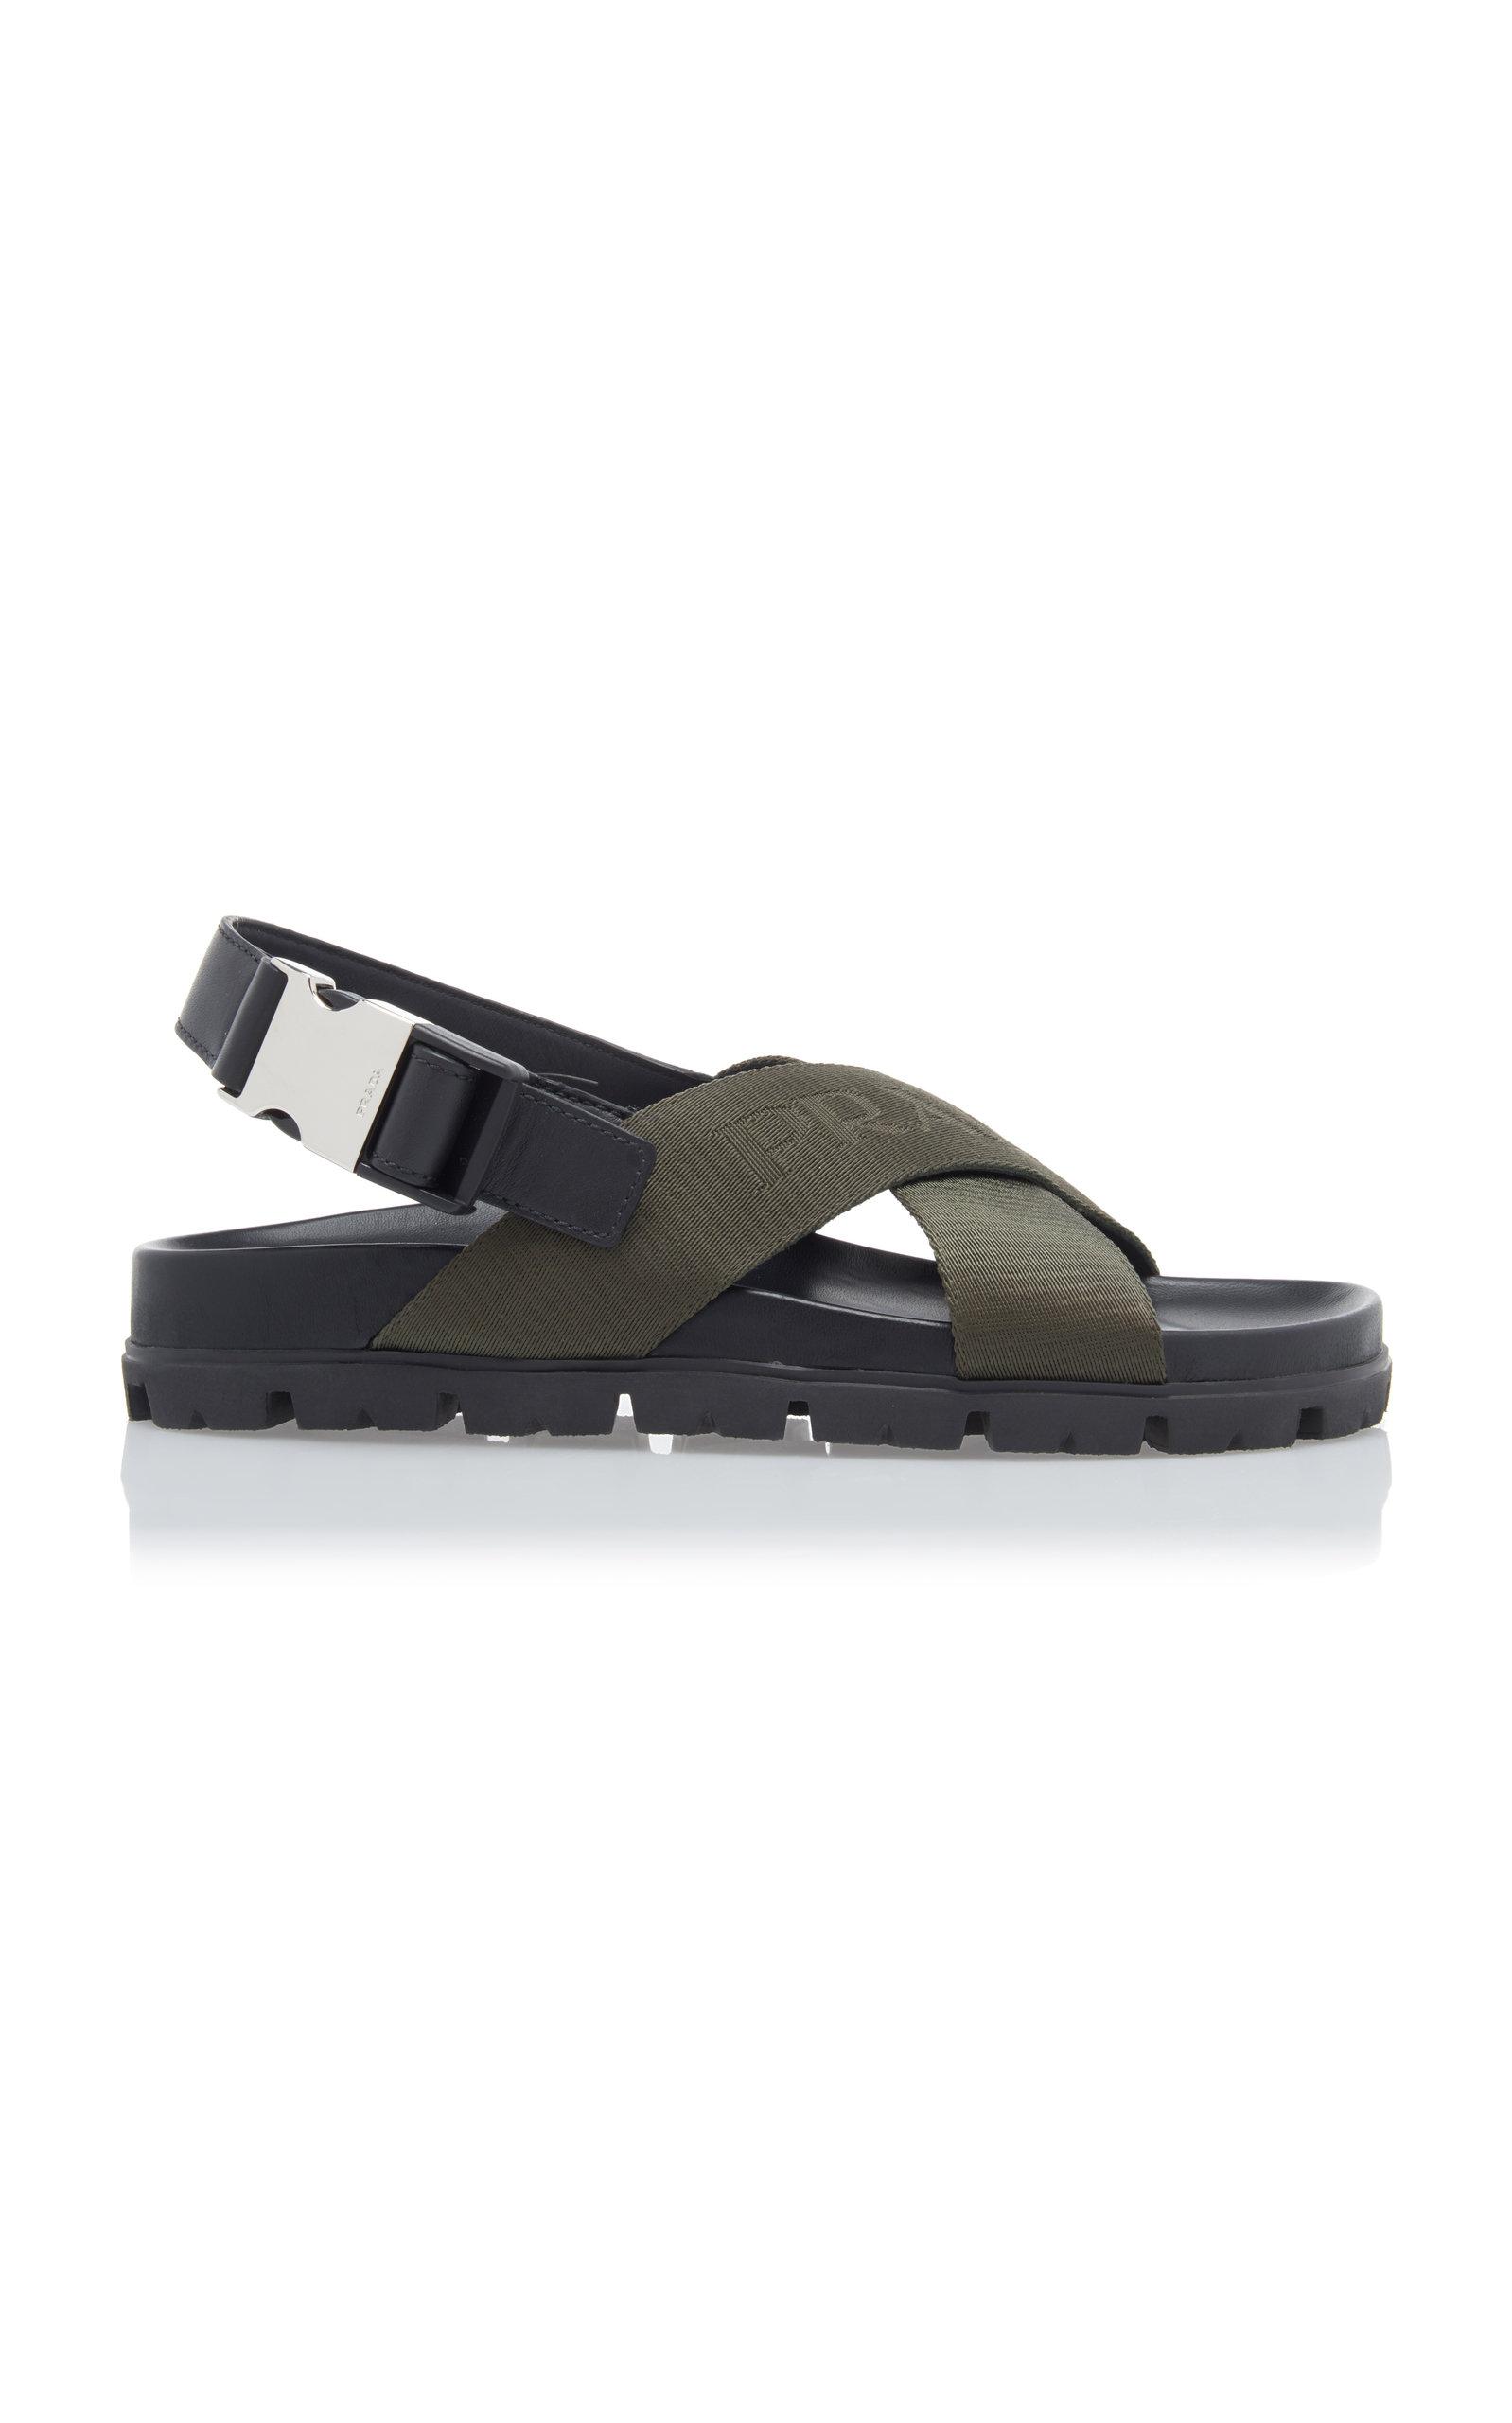 Prada Sandals Leather-Trimmed Canvas-Jacquard Sandals